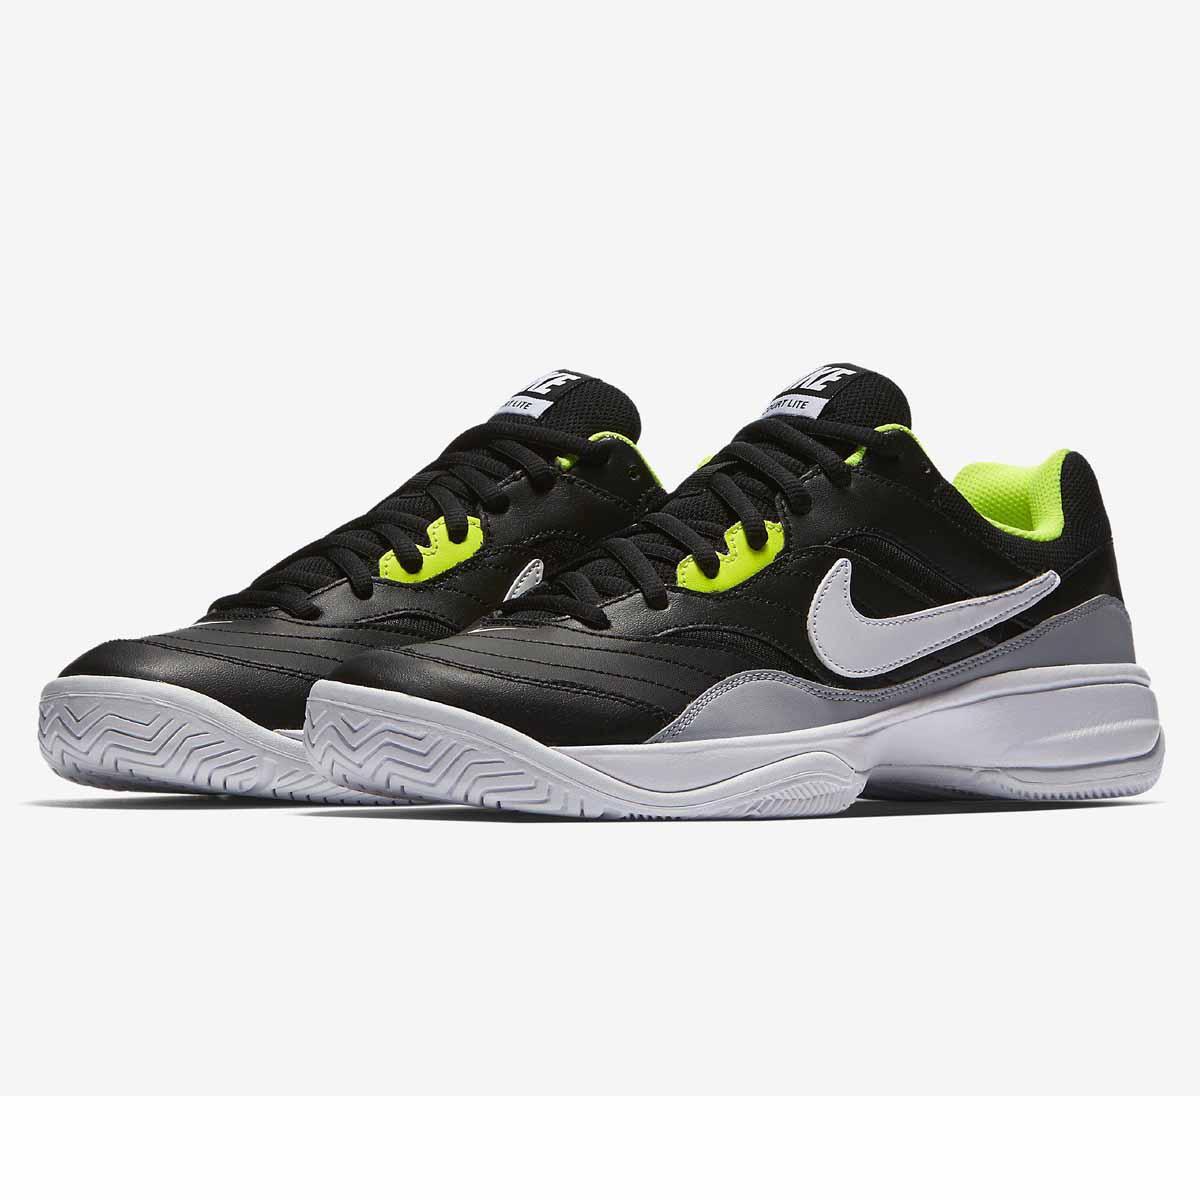 1b0be9724f860 Buy Nike Court Lite Tennis Shoes (Black/White/Volt) Online India